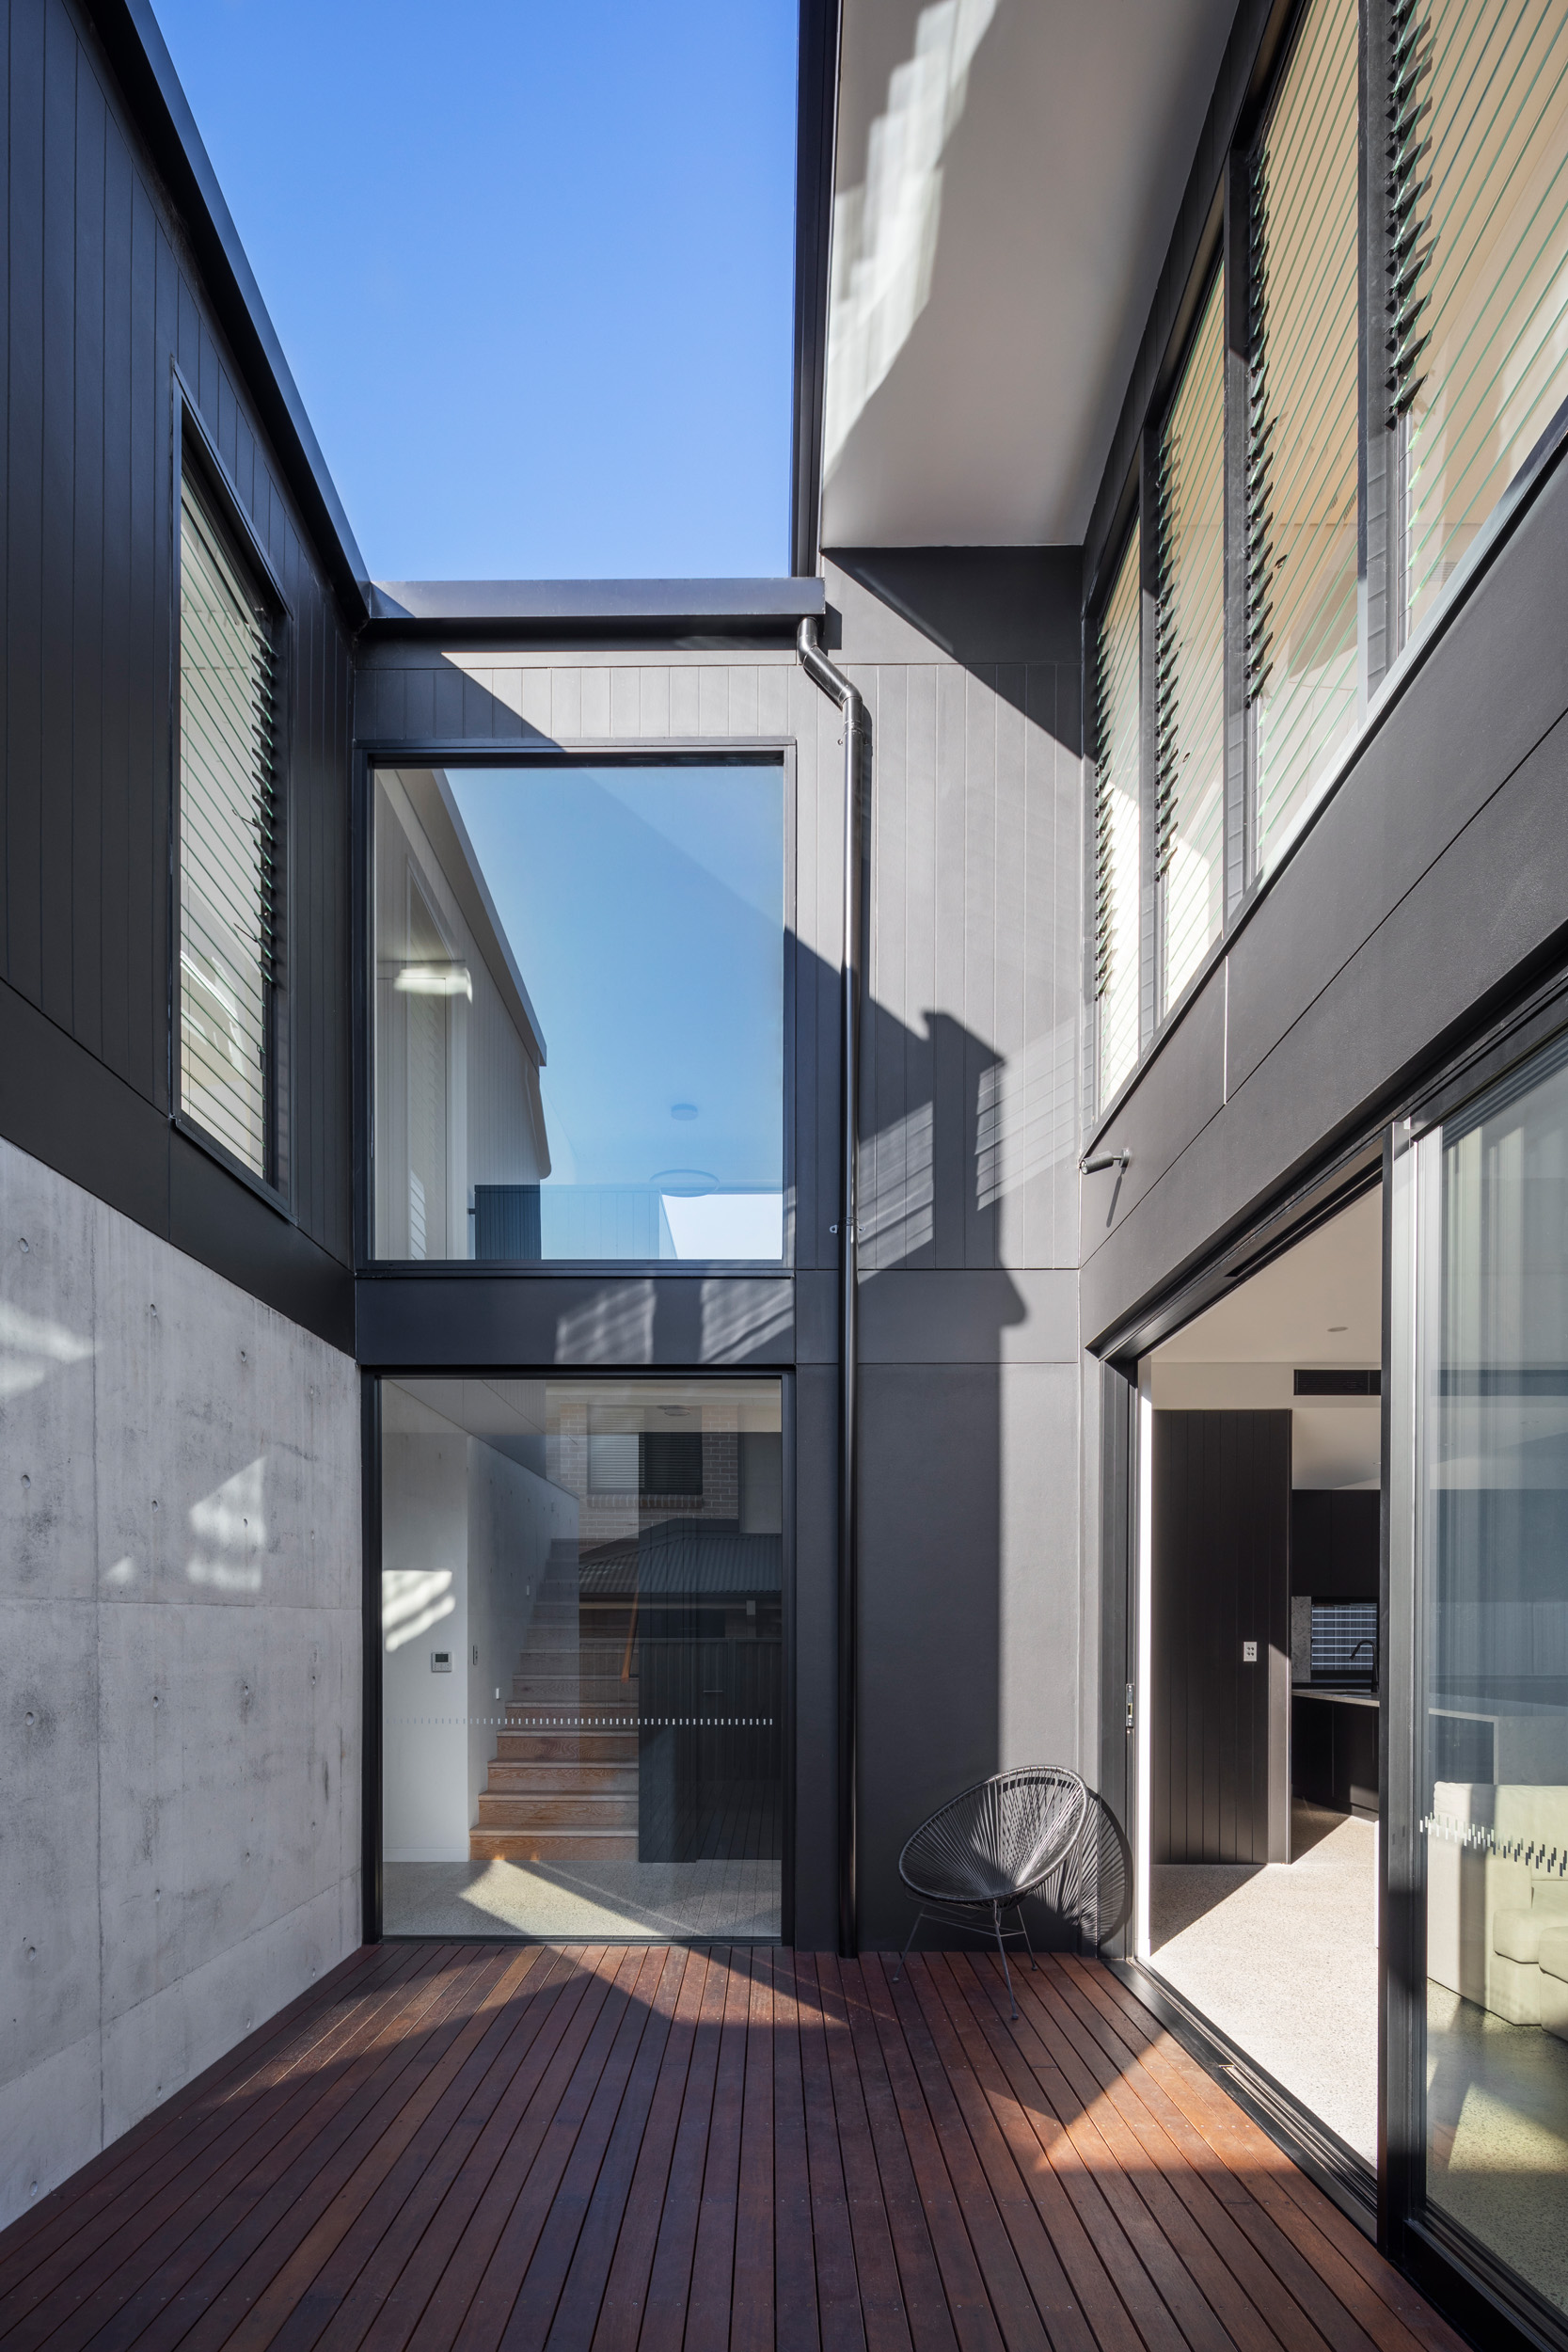 Jem_Cresswell_Architecture_Residential_Photographer_Sydney_Australia_023.jpg